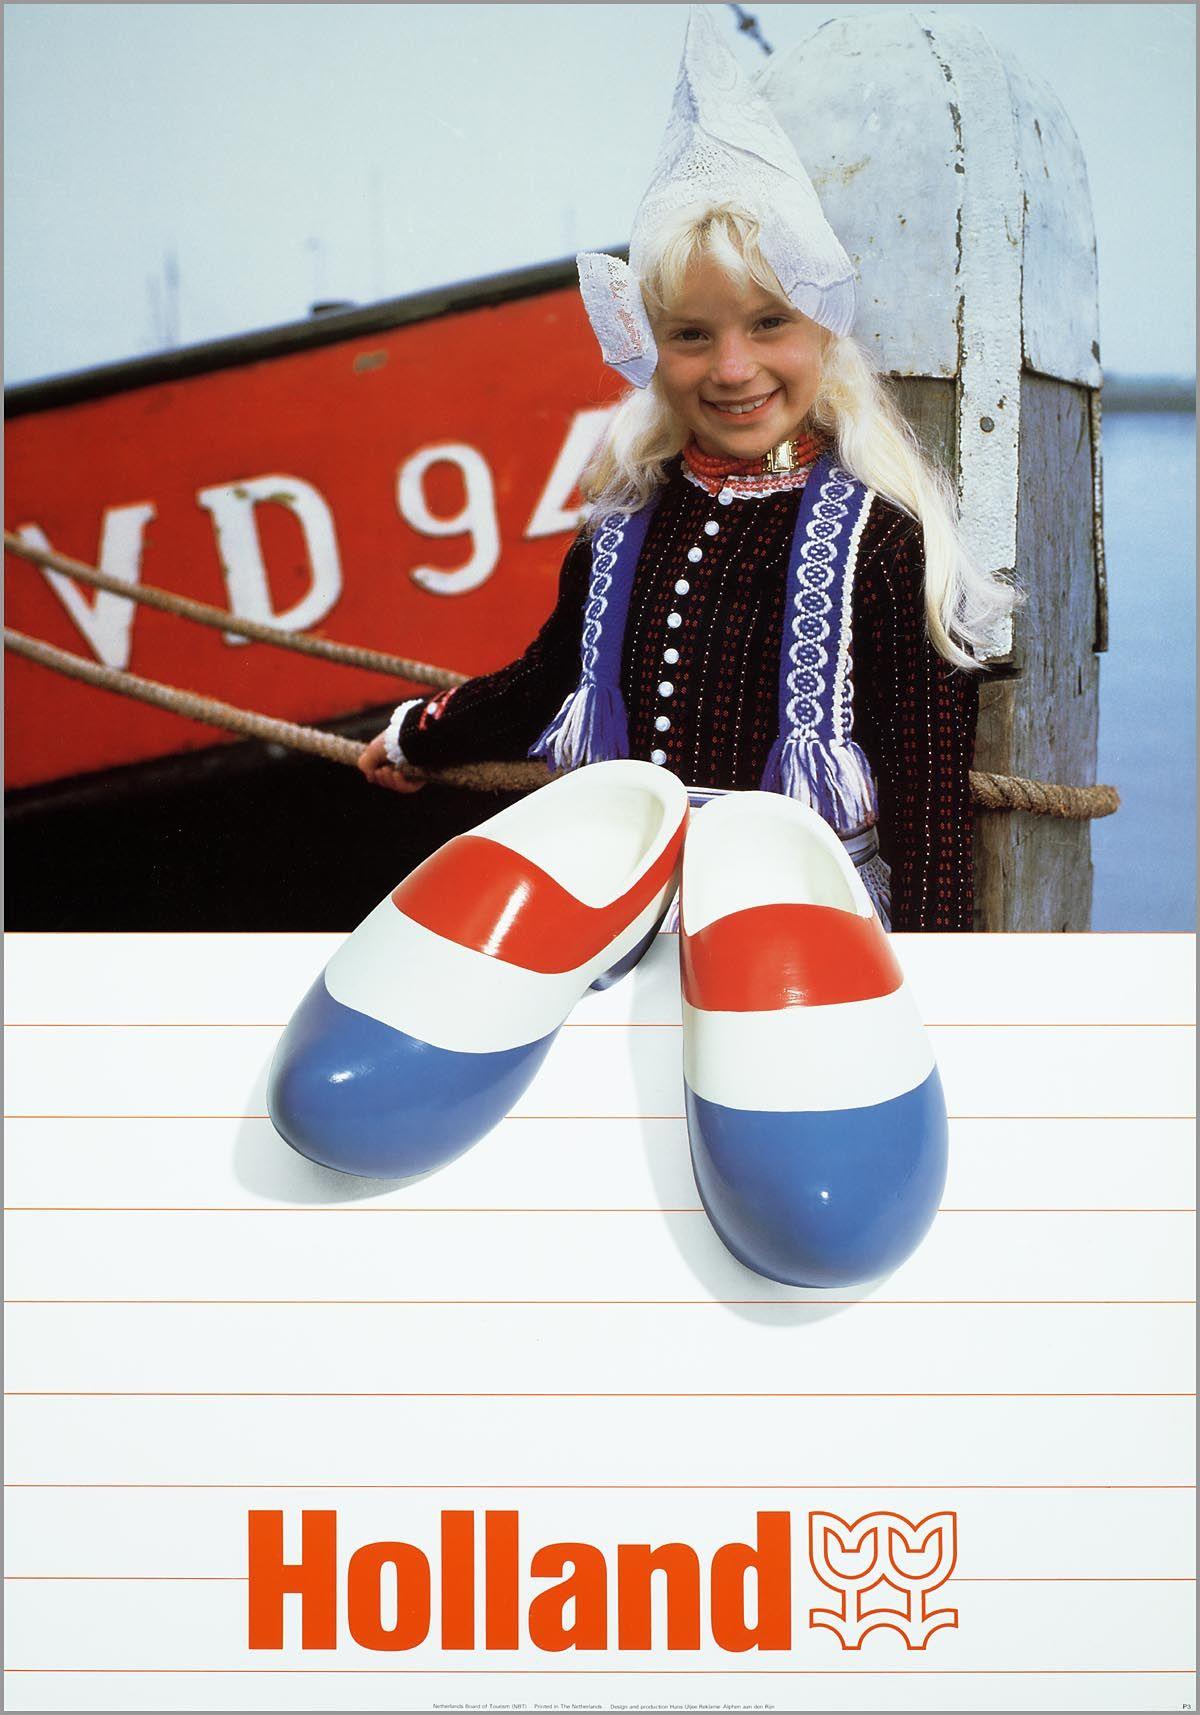 Meisje in Volendammer klederdracht met rood-wit-blauwe klompen 1982 NBT Media en communicatie Reclame affiche Holland #NoordHolland #Volendam